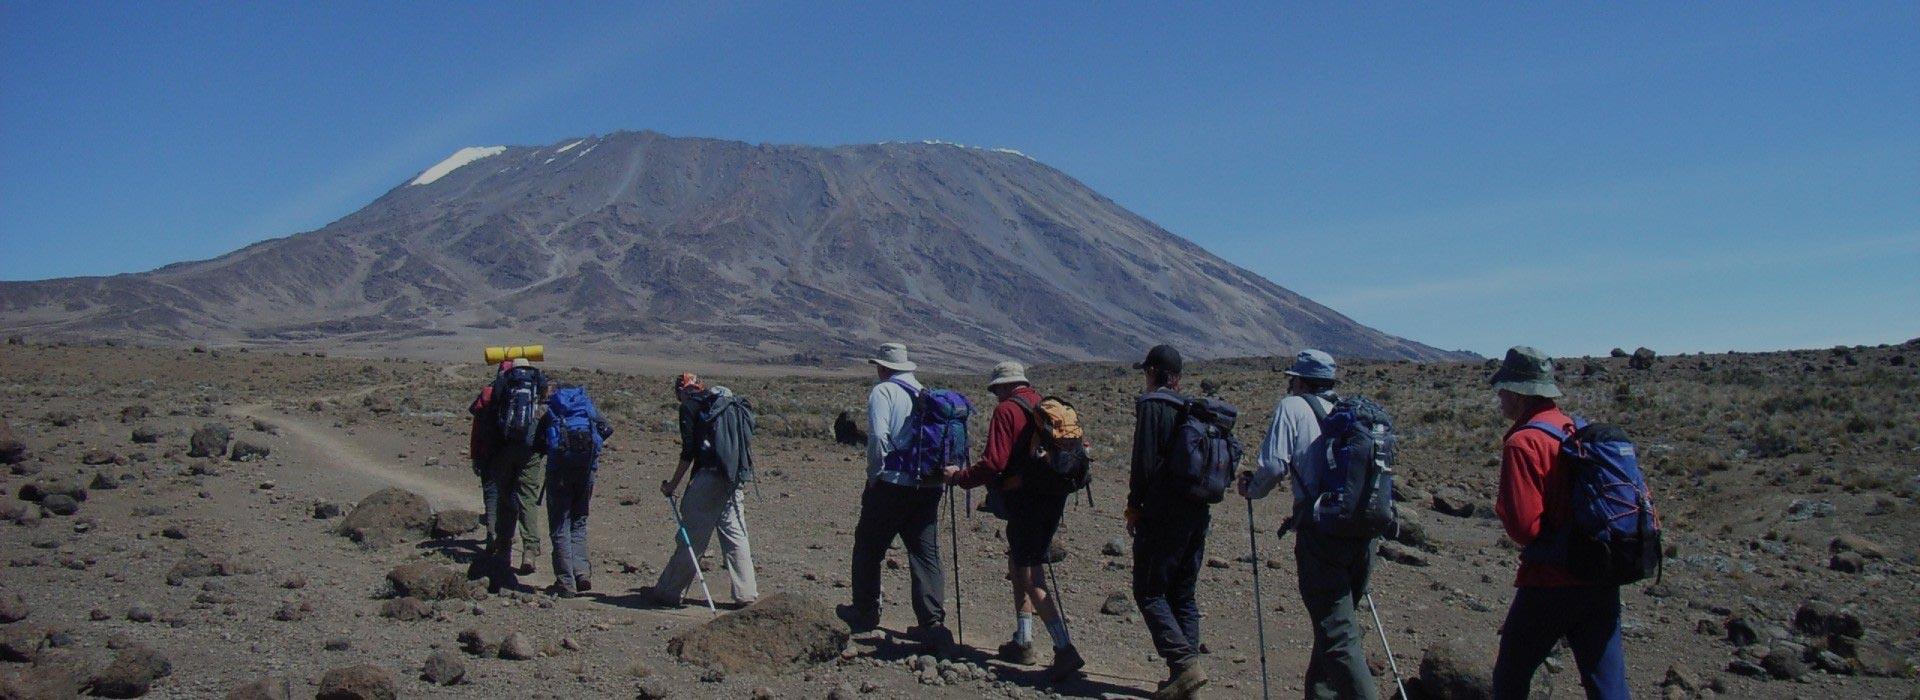 Training To Climb Kilimanjaro